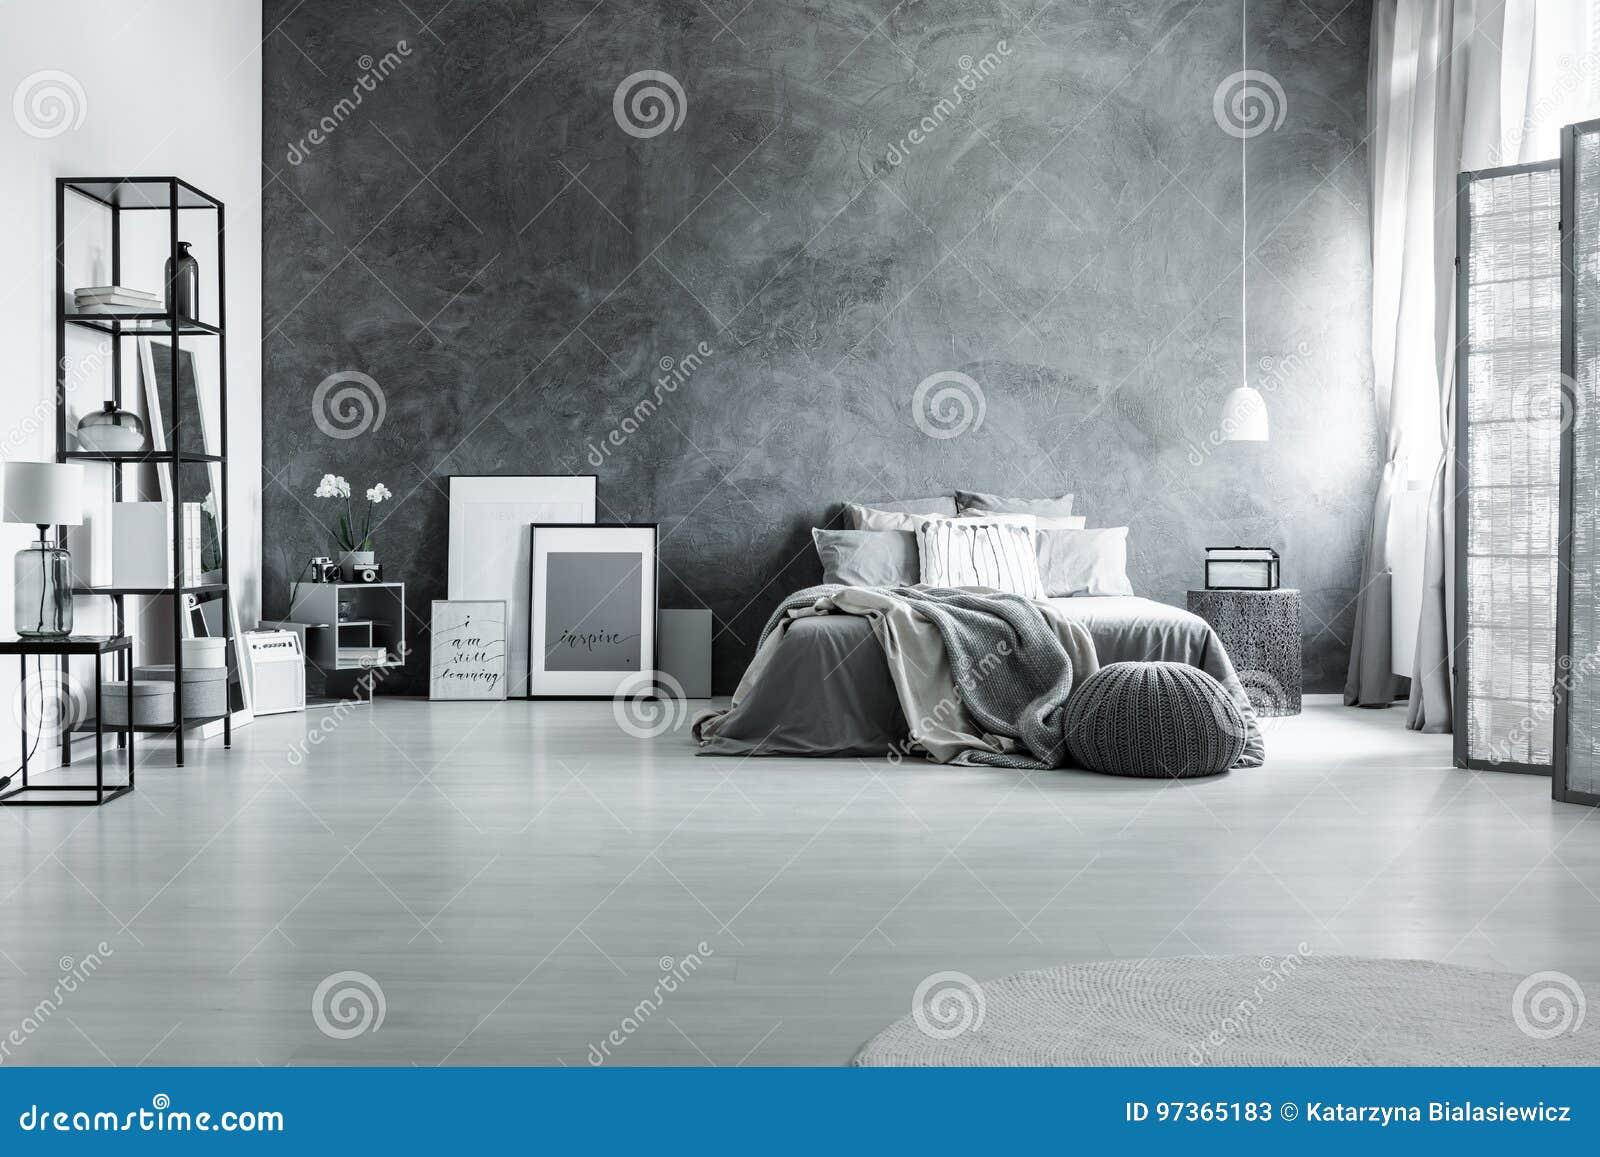 Minimalist And Gray Loft Bedroom Stock Image Image Of Interior - Gray-bedroom-minimalist